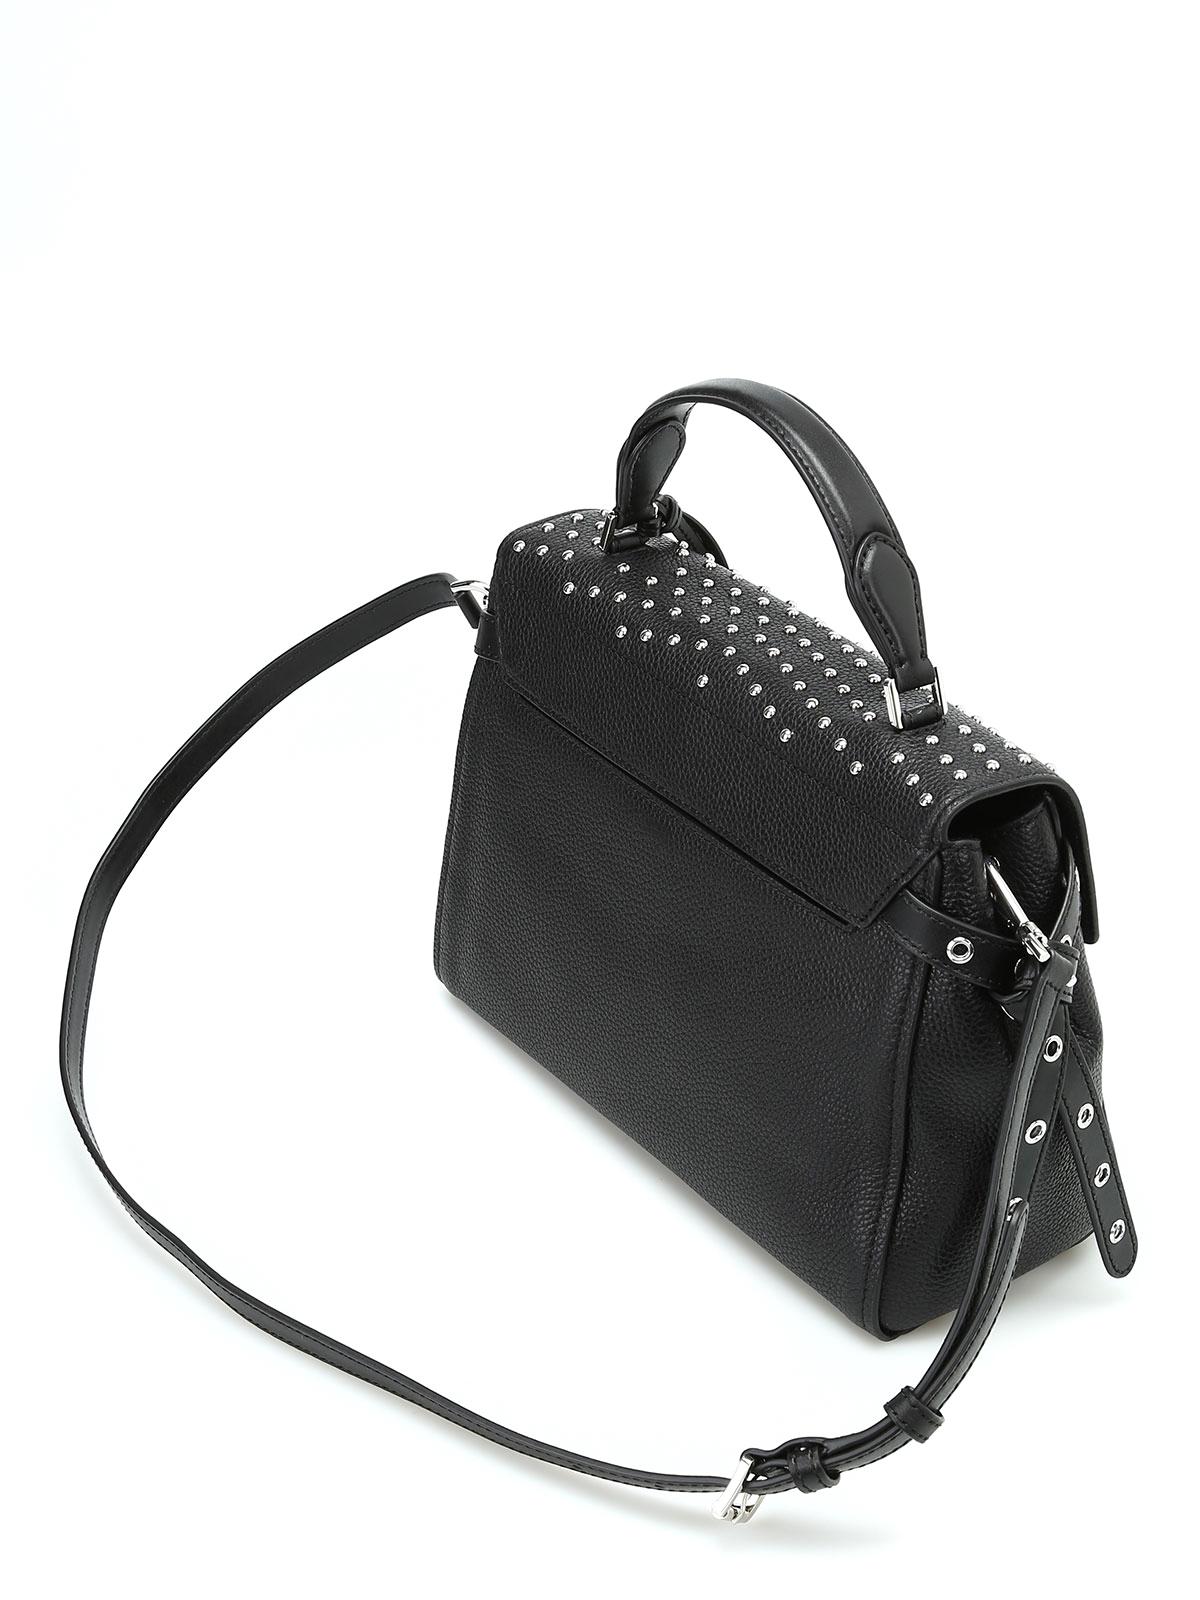 44bc469b3537b iKRIX MICHAEL KORS  bowling bags - Bristol medium studded satchel bag